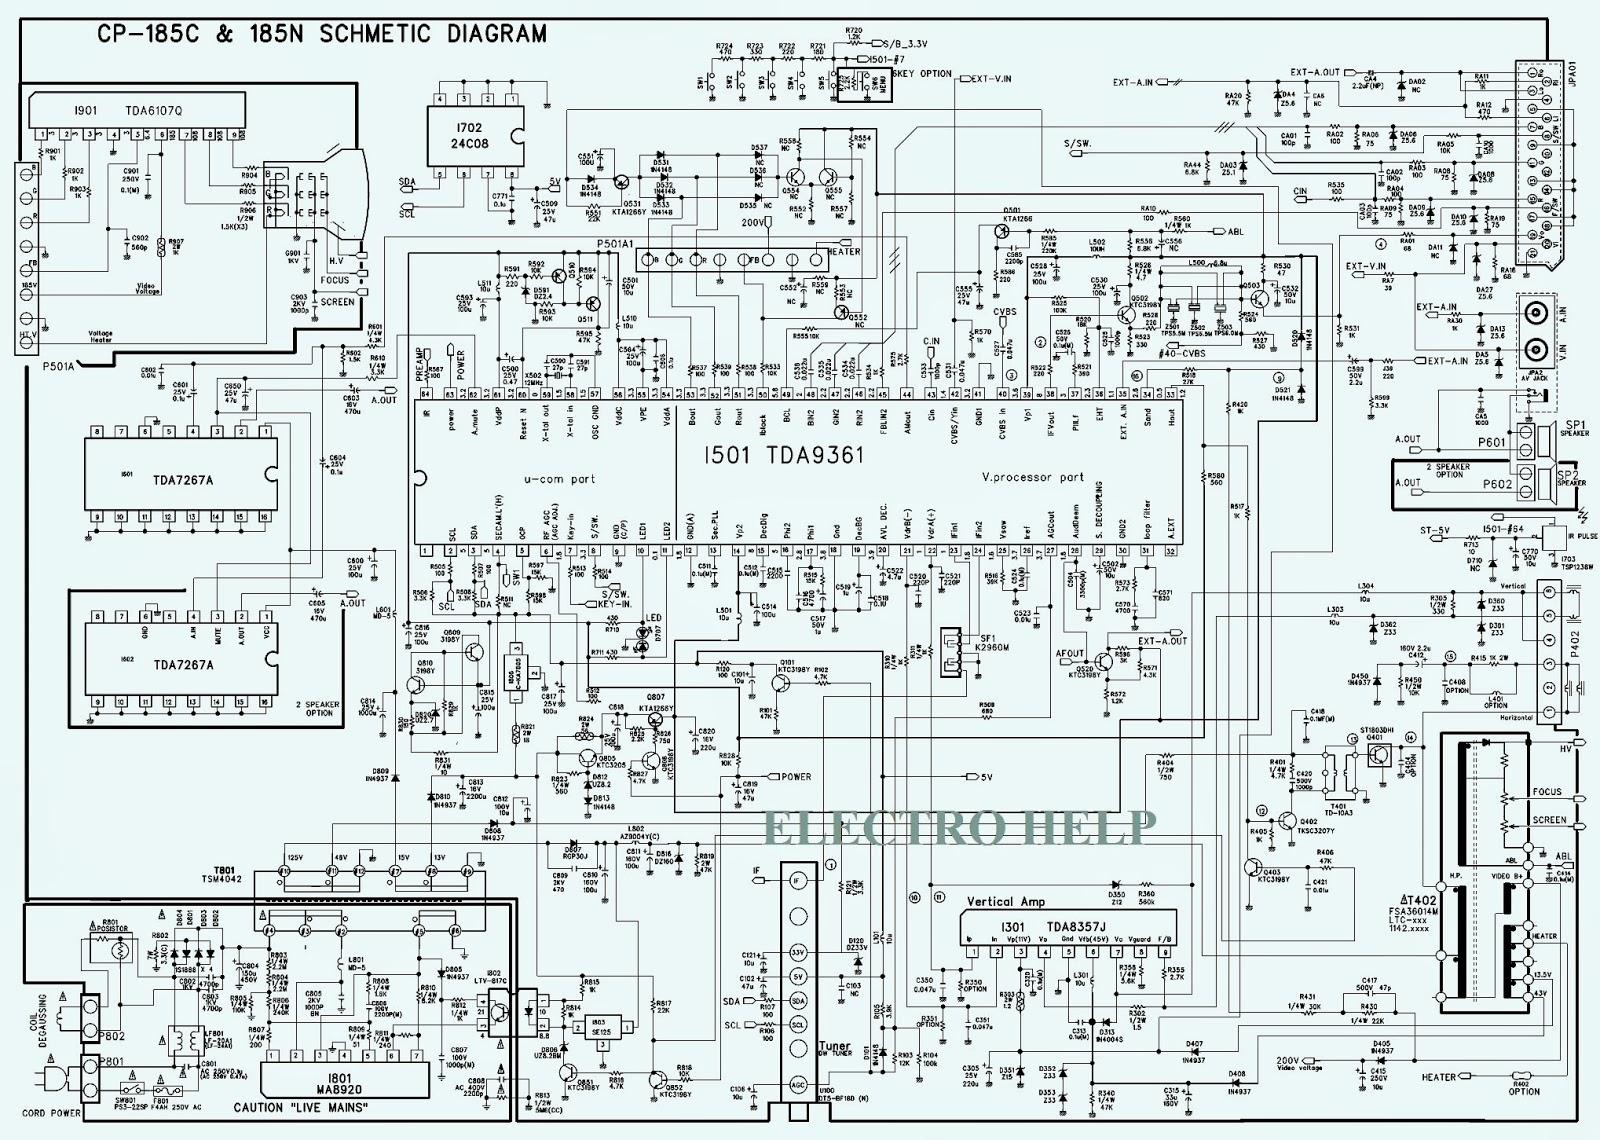 Daewoo Refrigerator Wiring Diagram Free Download Diagrams Ge 1967 Unusual Electrolux Vacuum Ideas New 2018 At Icemaker